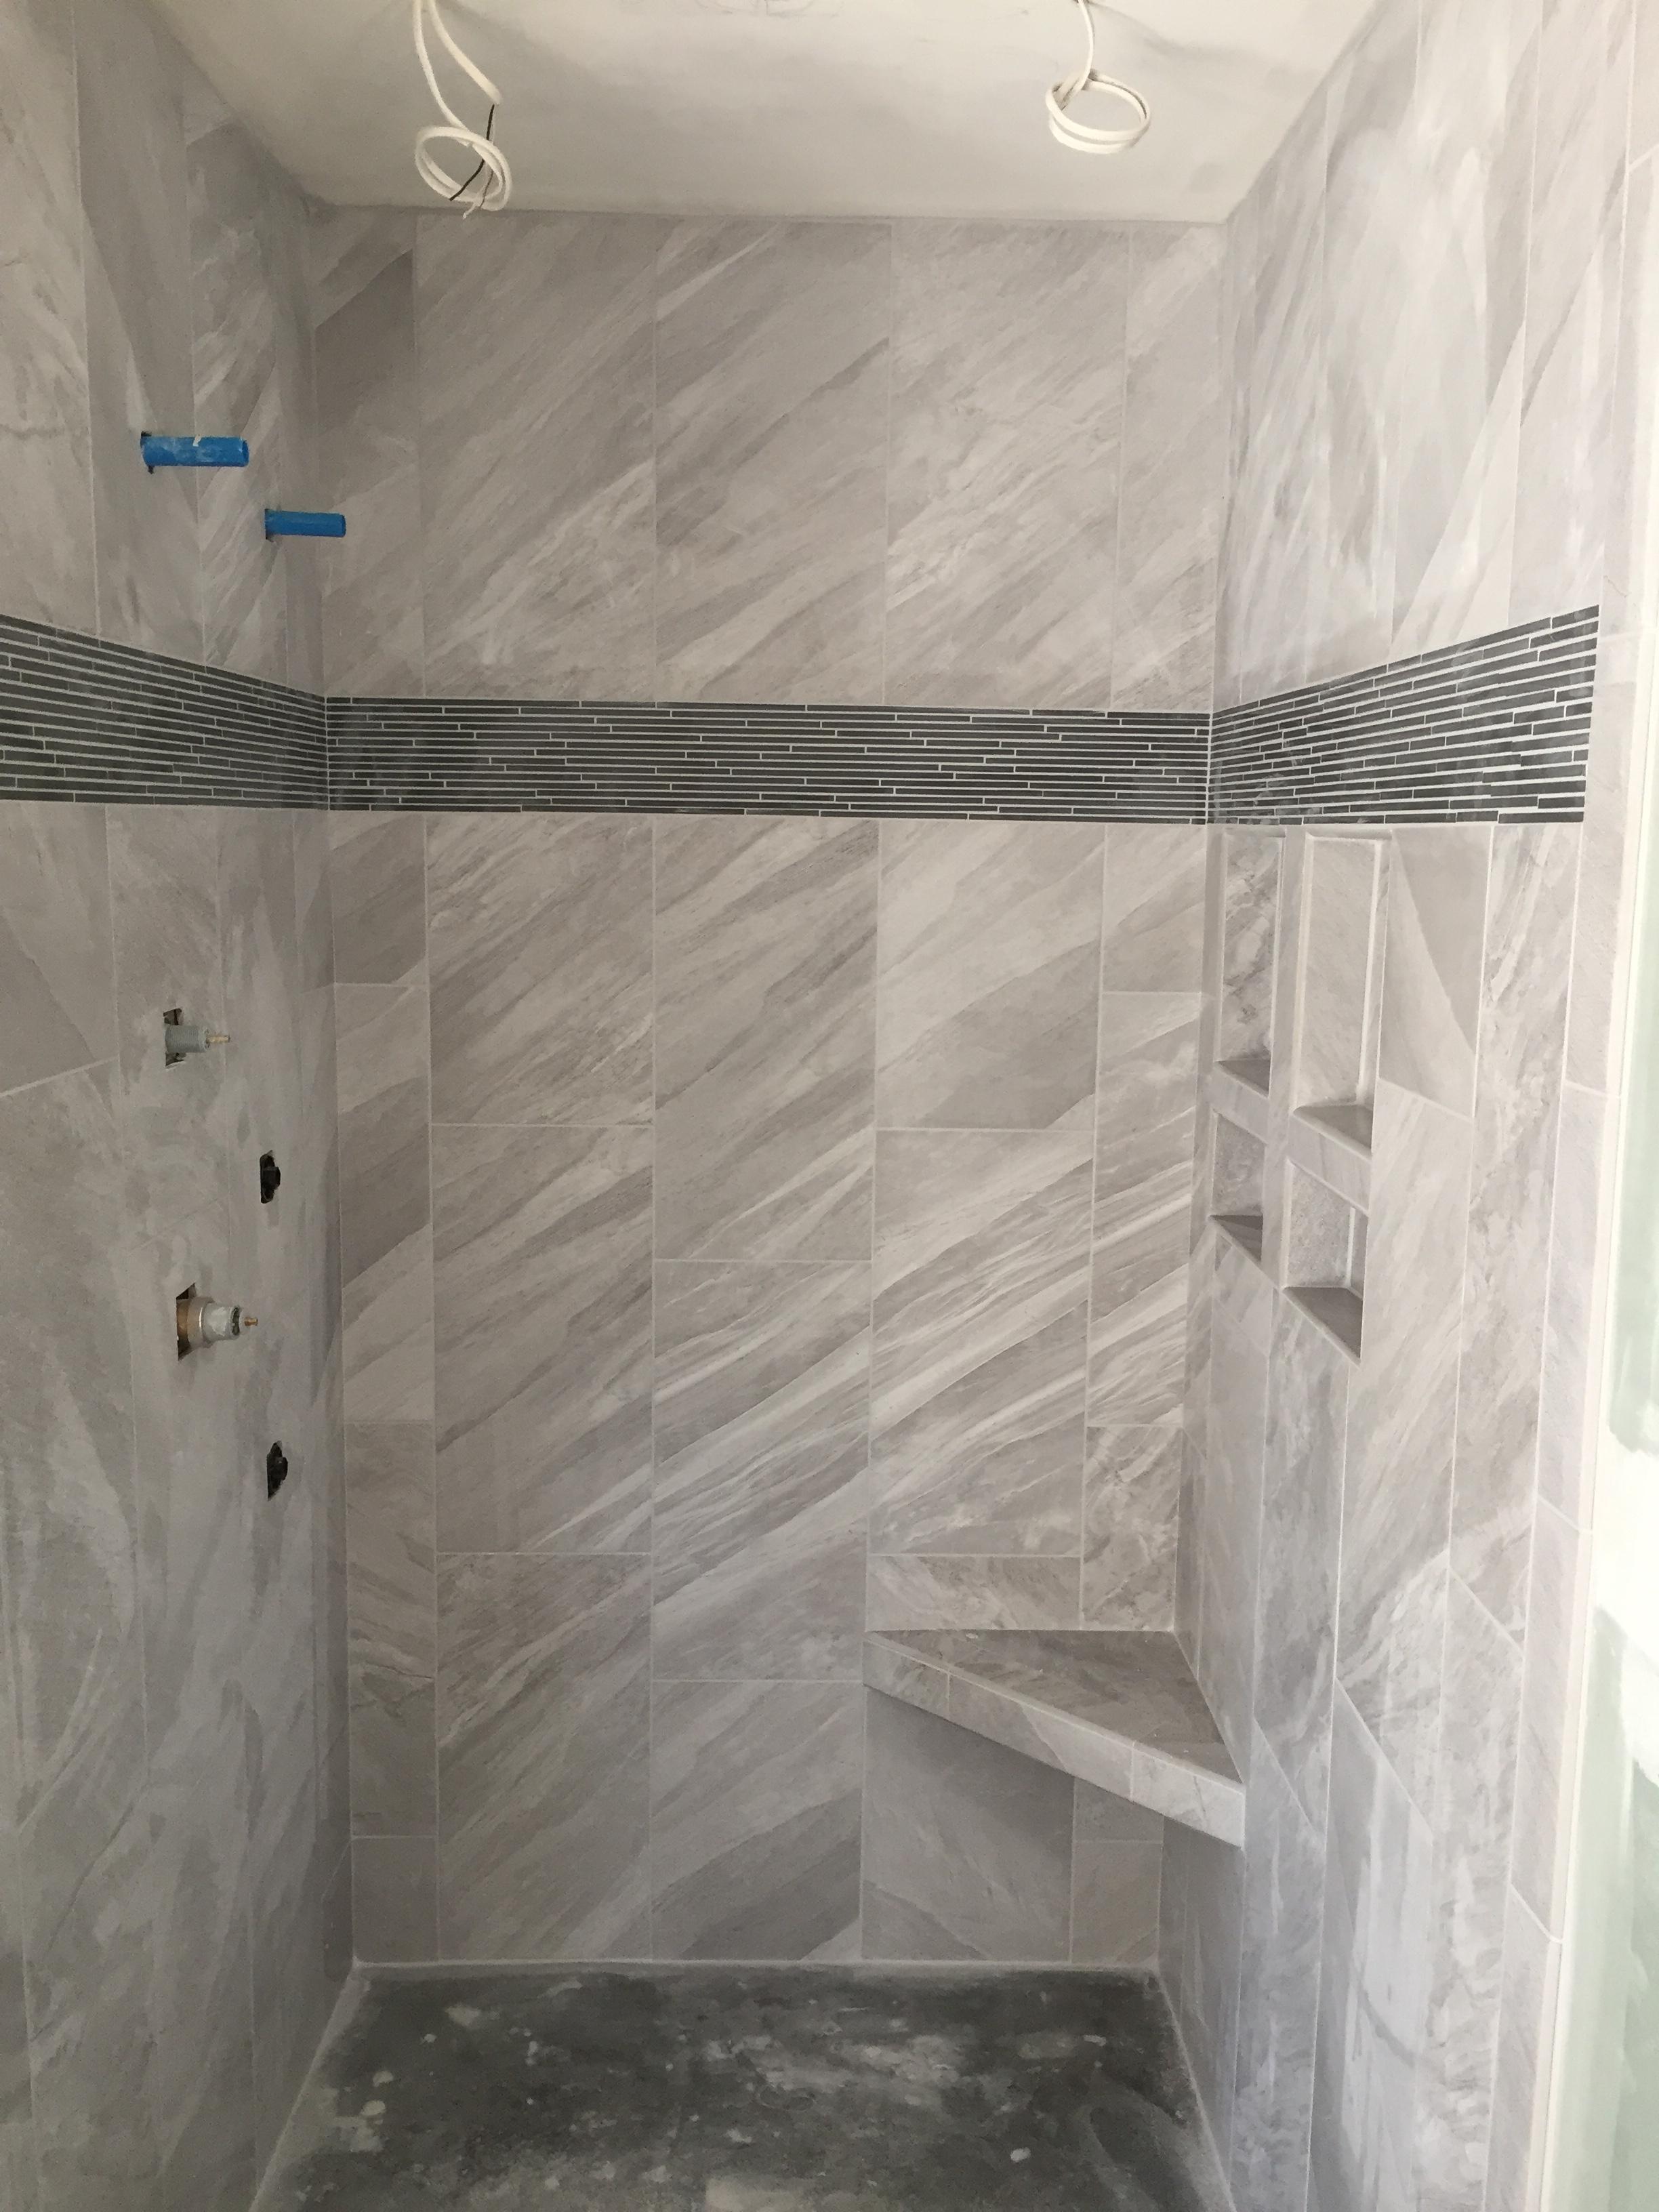 Marshall Arts Tile And Bath In Newport News Va 23606